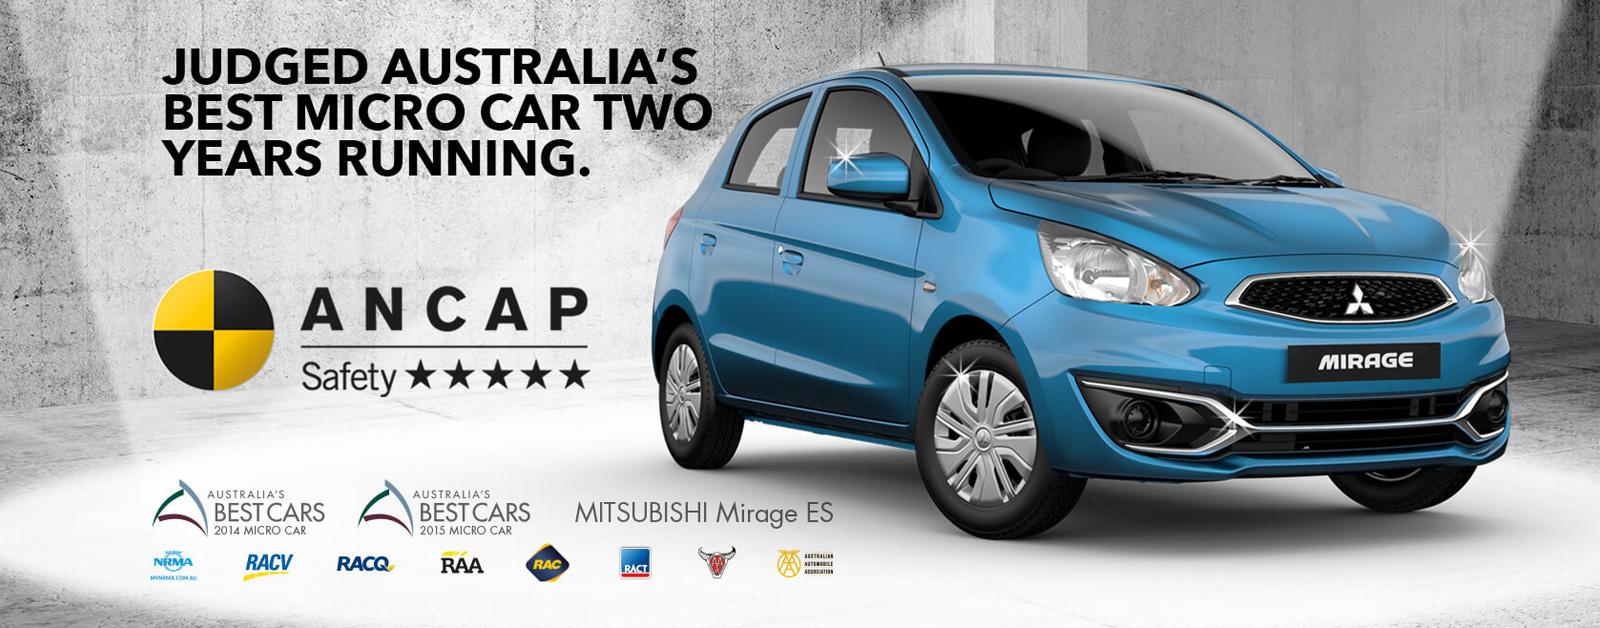 Mitsubishi Mirage, Australia's best micro car two years running. Test drive at Redcliffe Mitsubishi Brisbane.